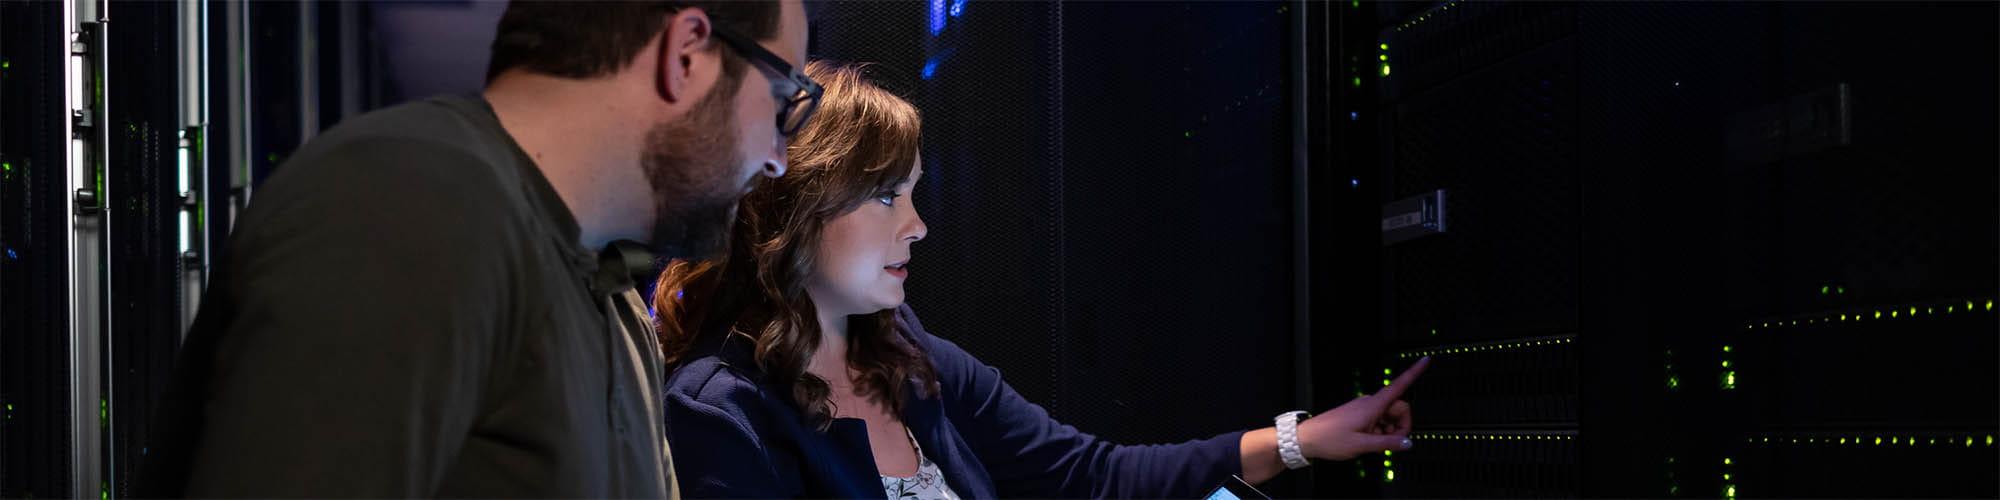 Man and woman looking at servers